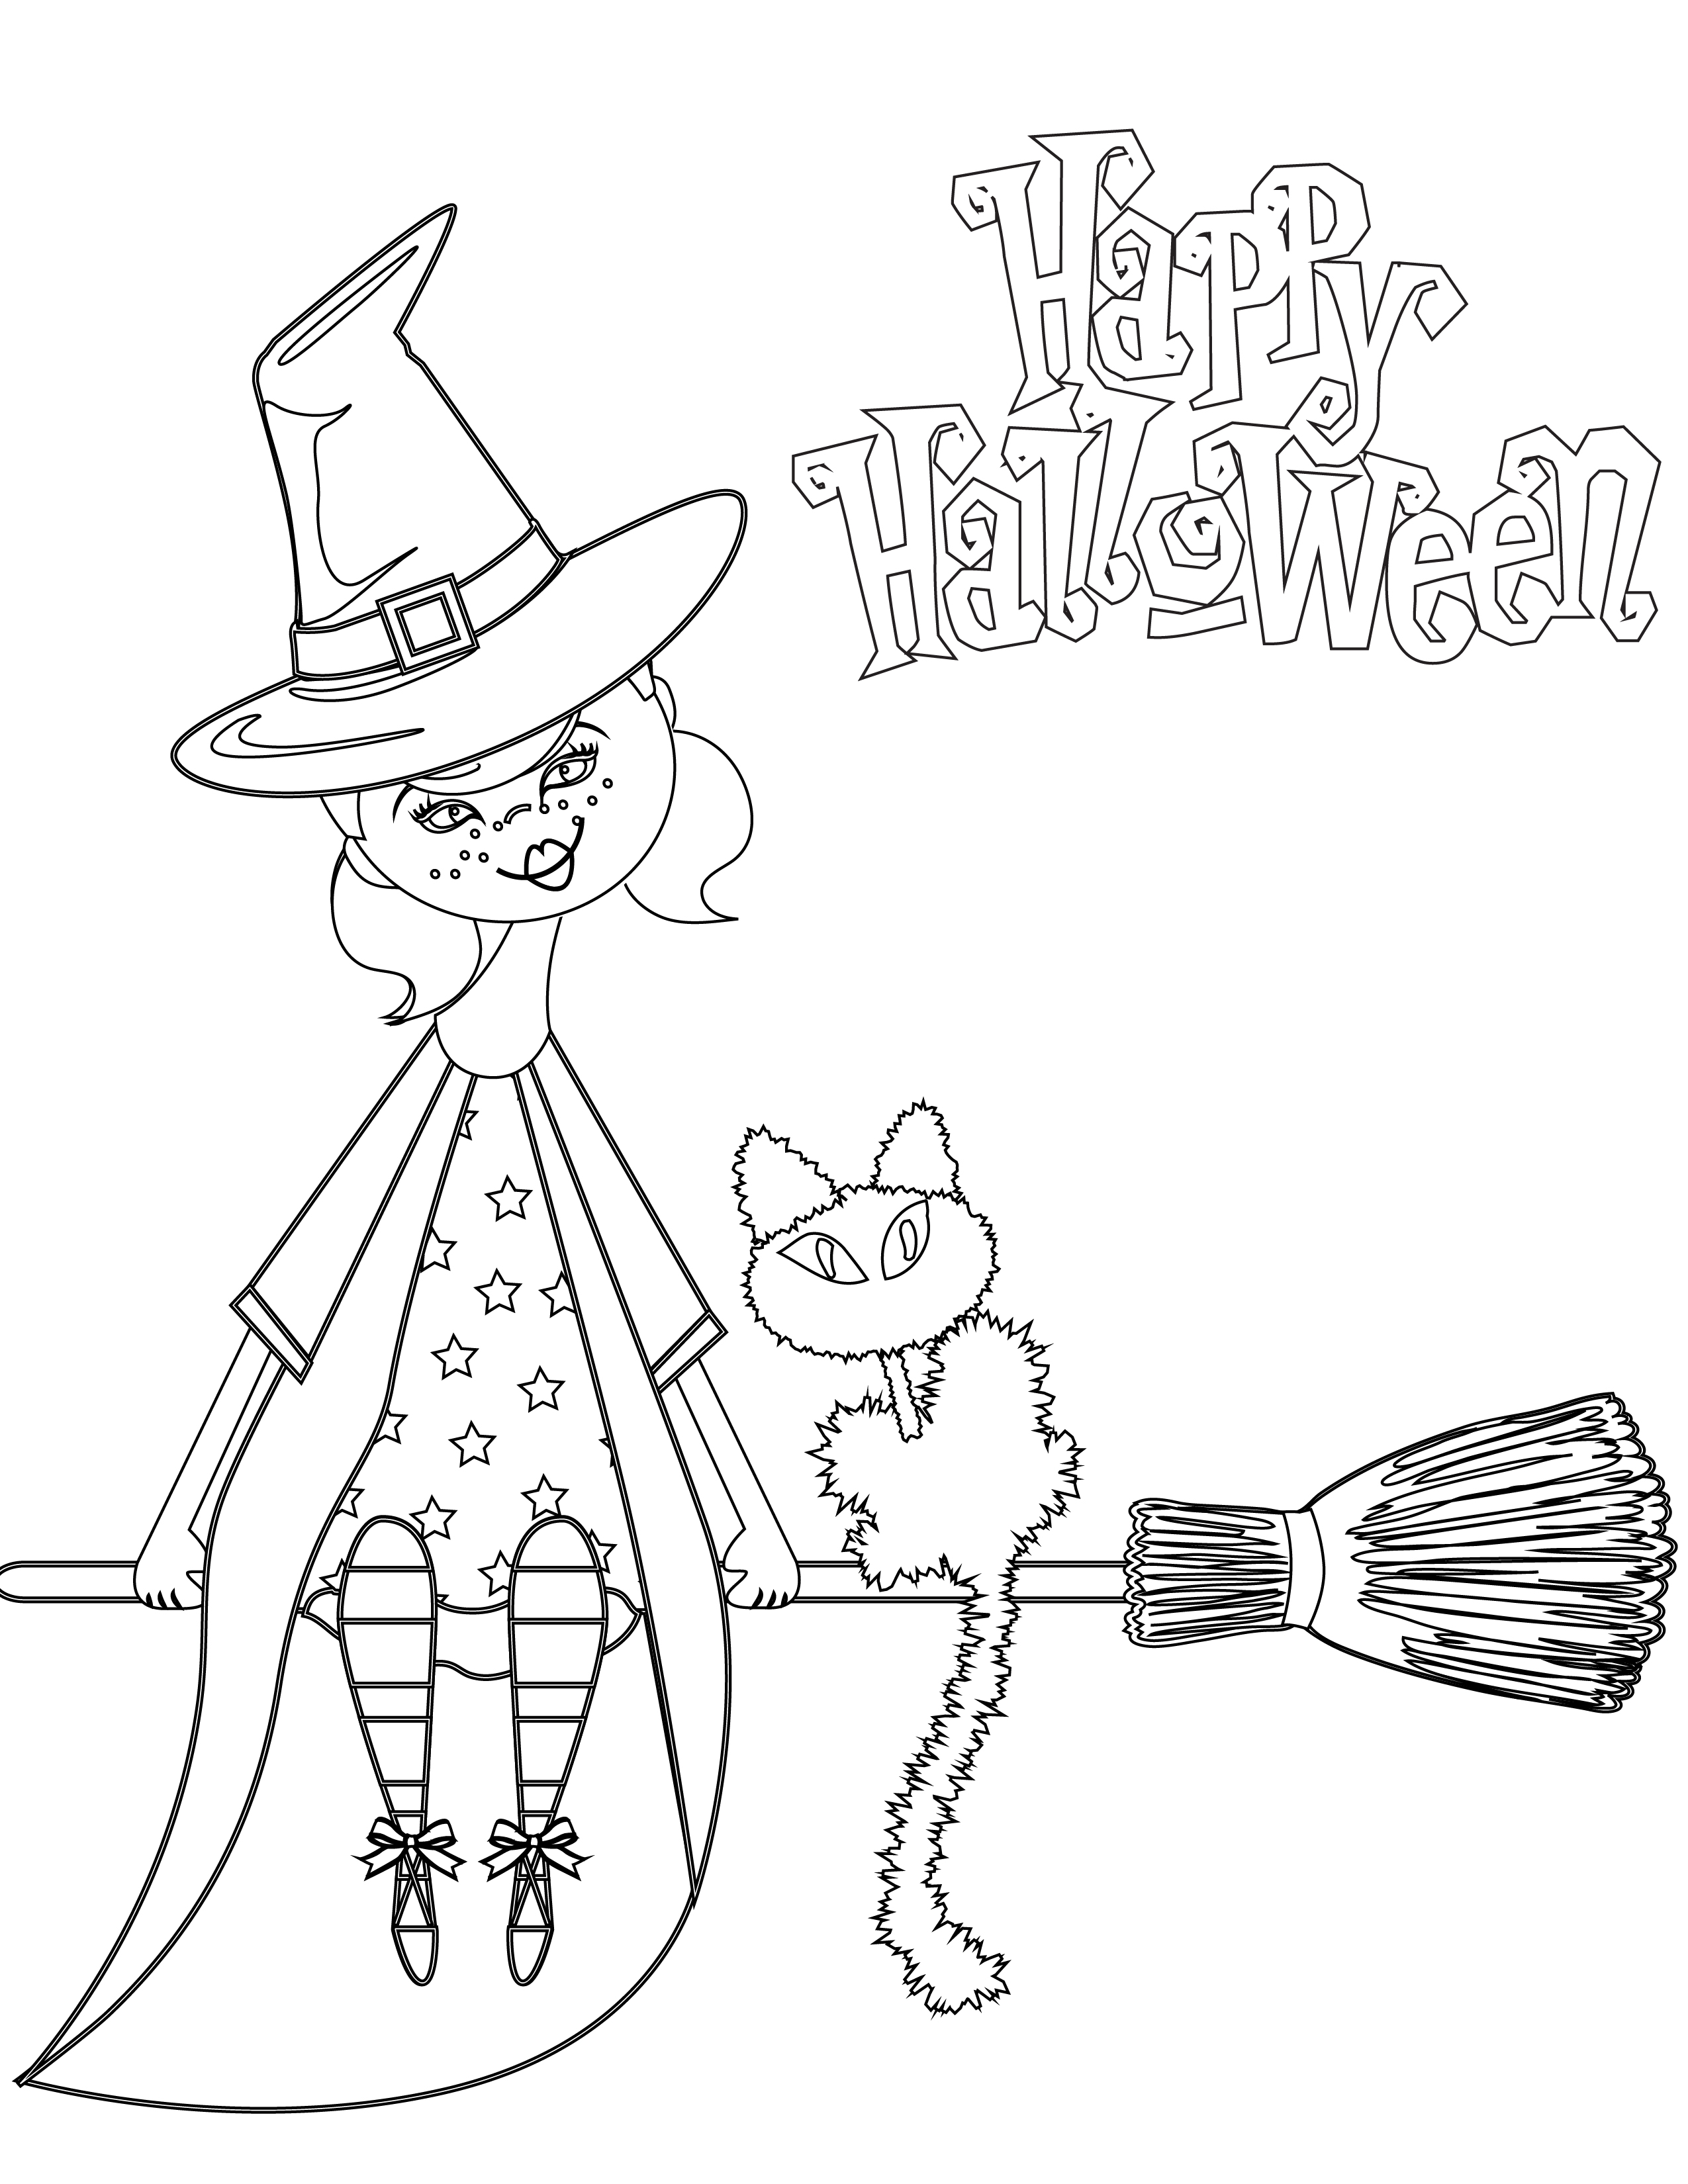 Dessin A Imprimer Joyeux Halloween Sorciere Artherapie Ca